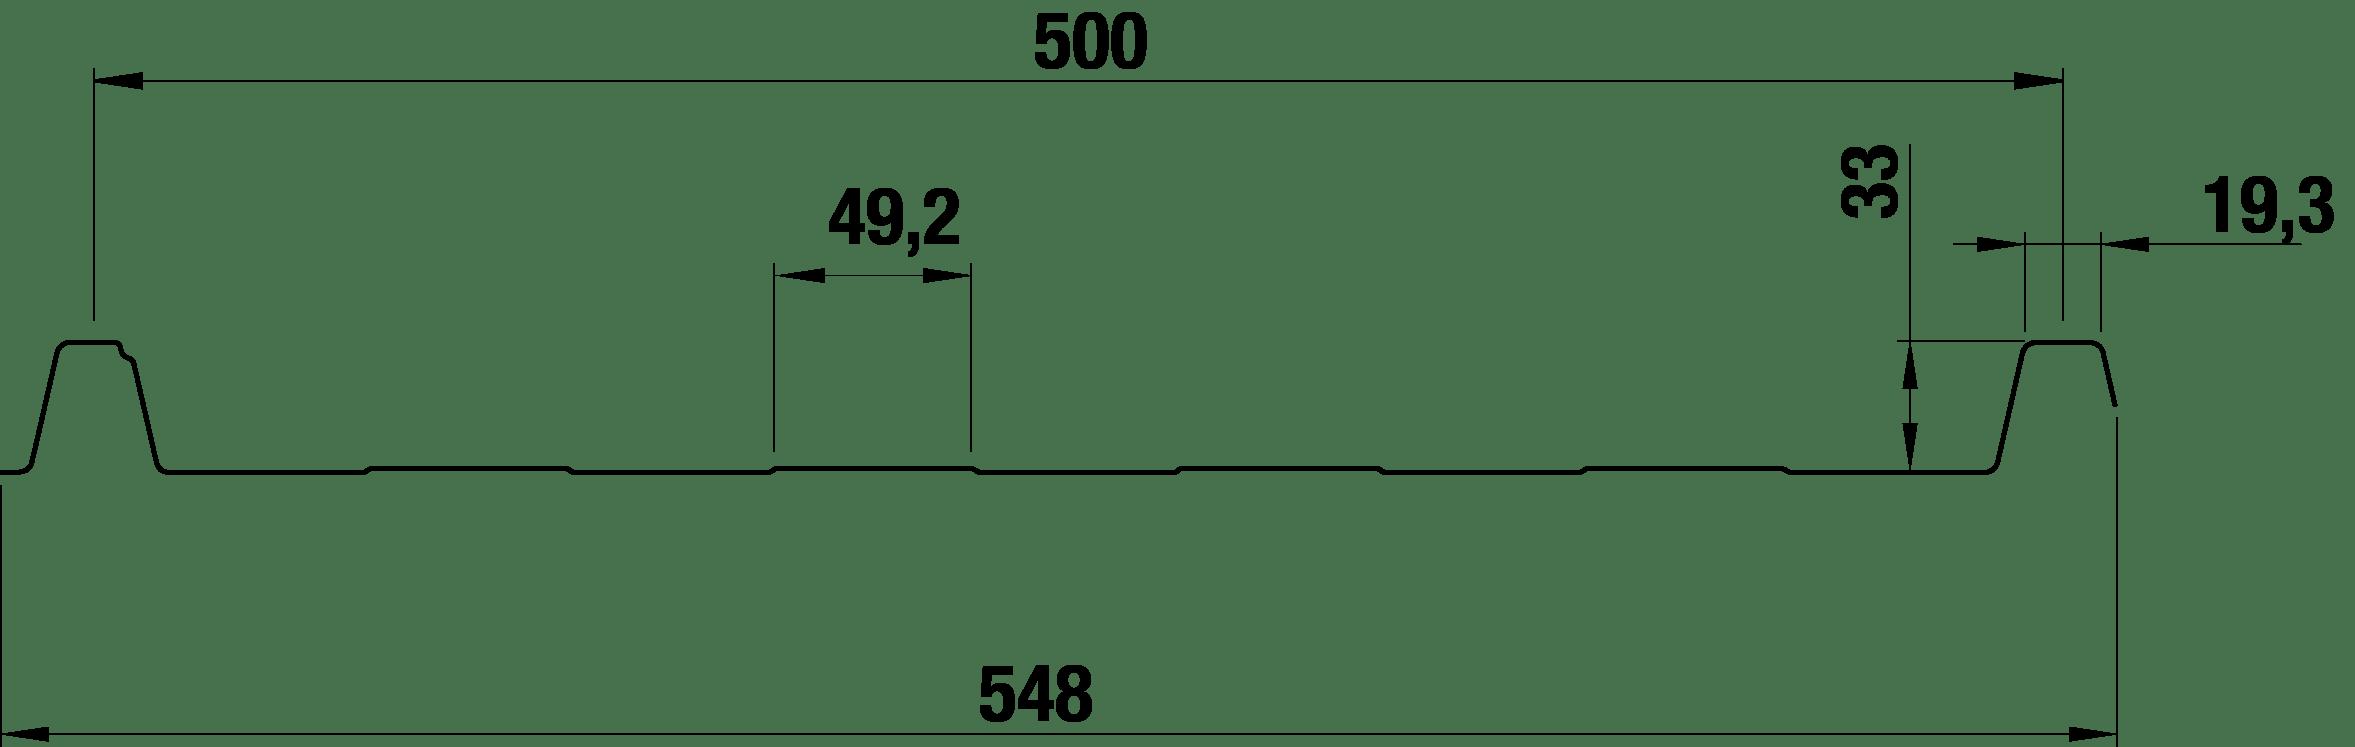 Trapezblech 33/500 – T33P Tech Zeichnung